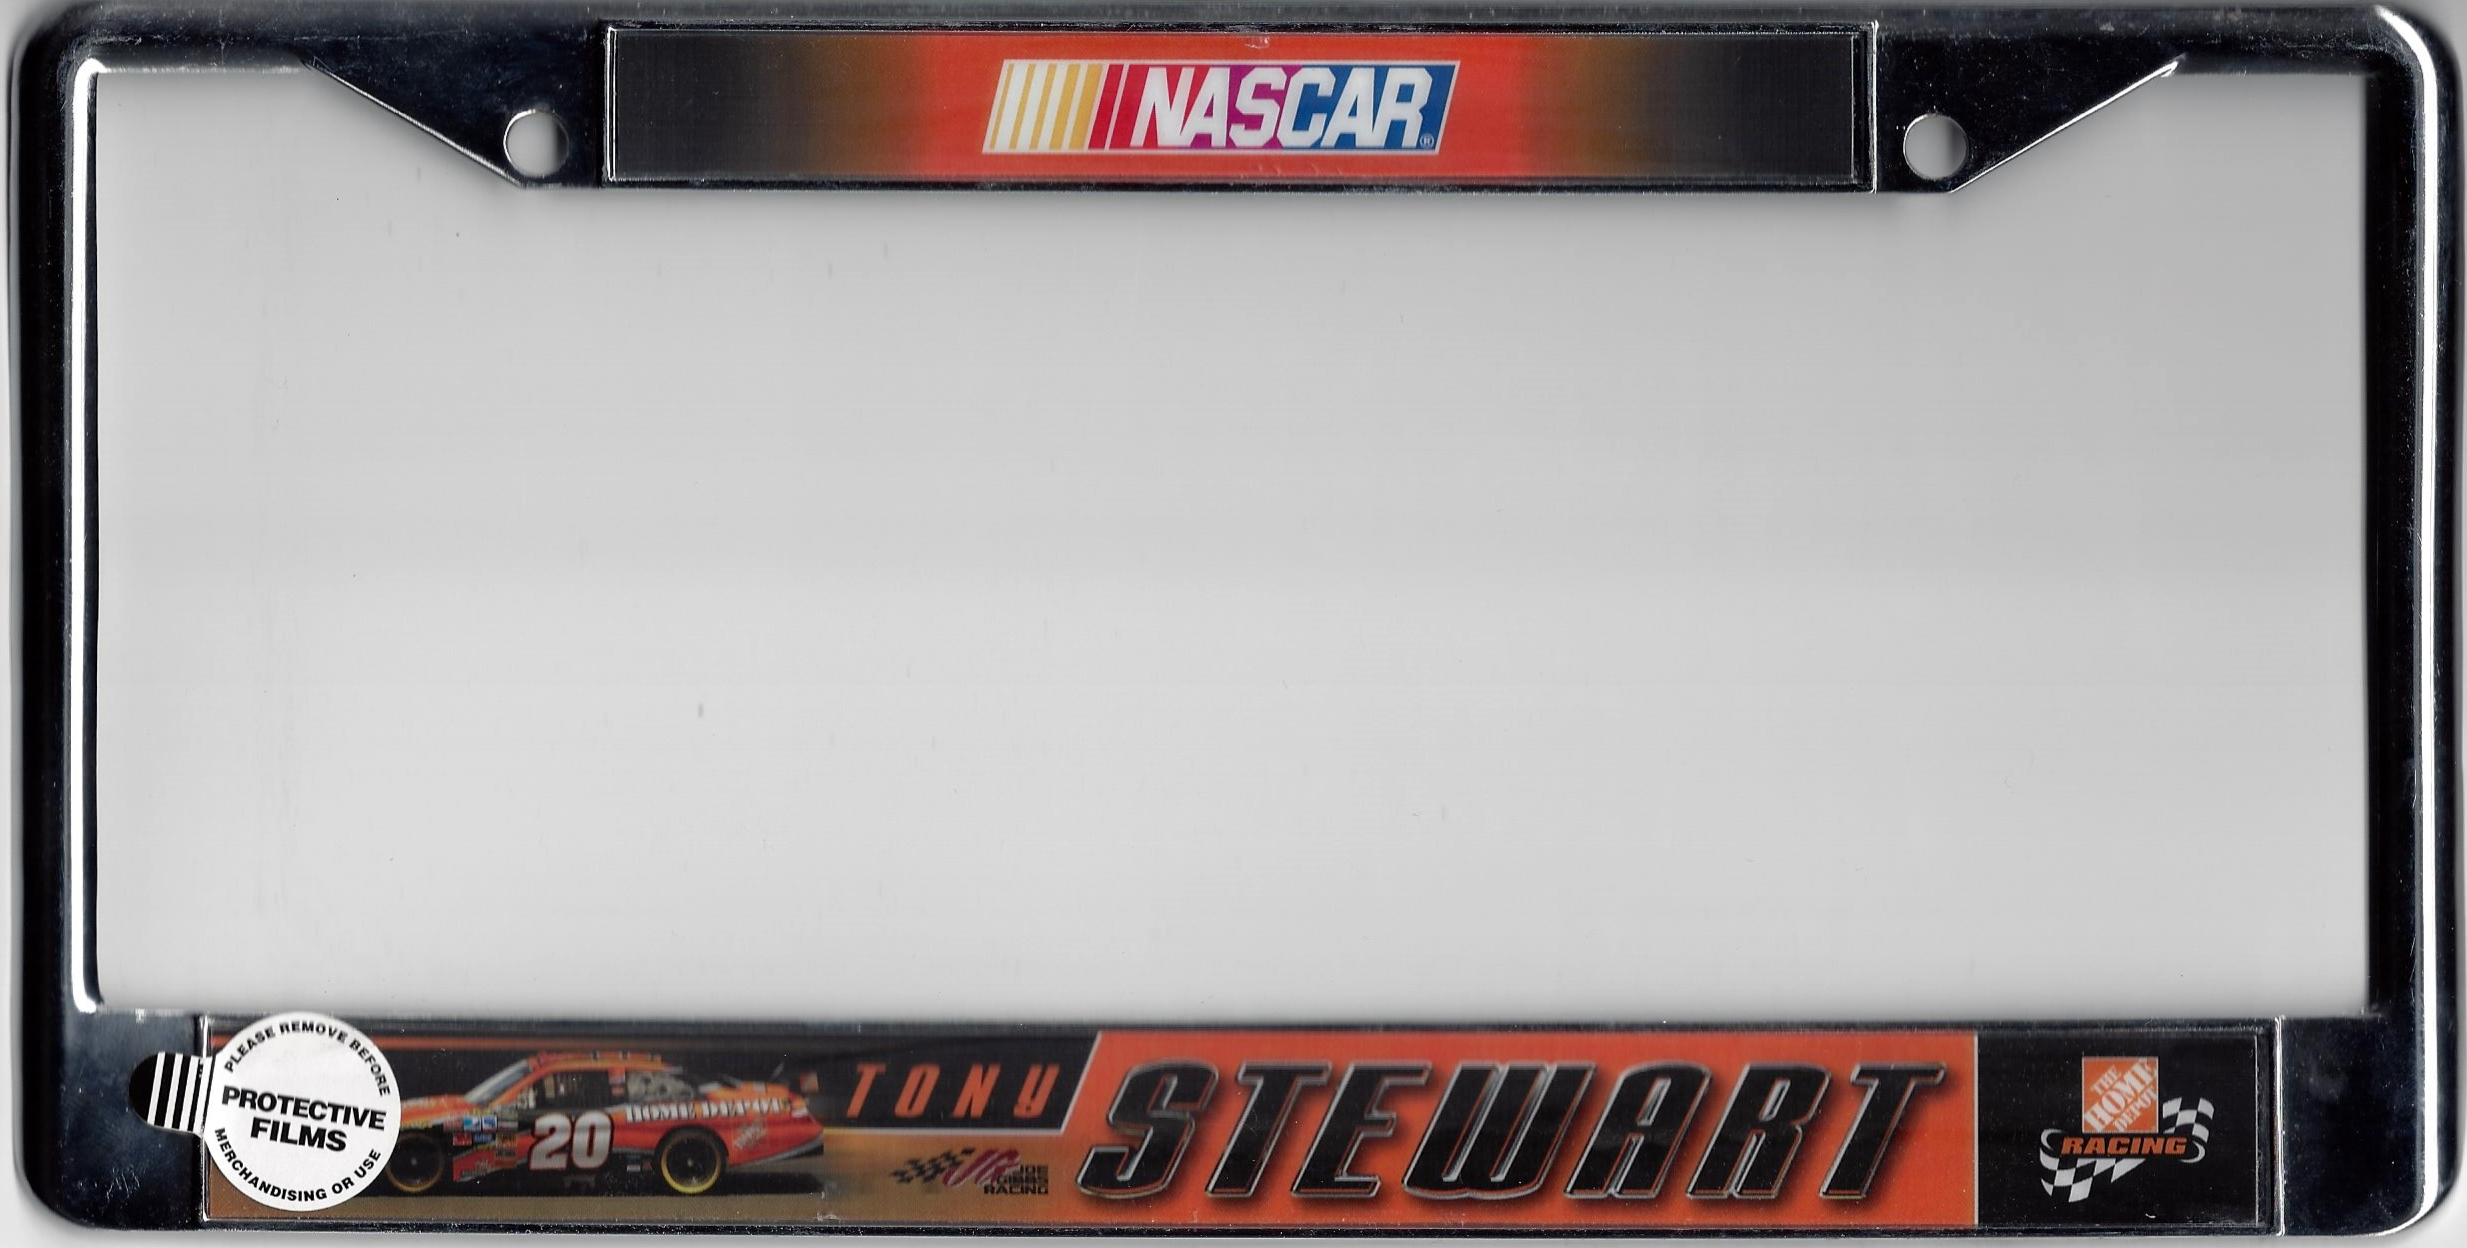 Tony Stewart License Plate Frame [W19158081] - $16.99